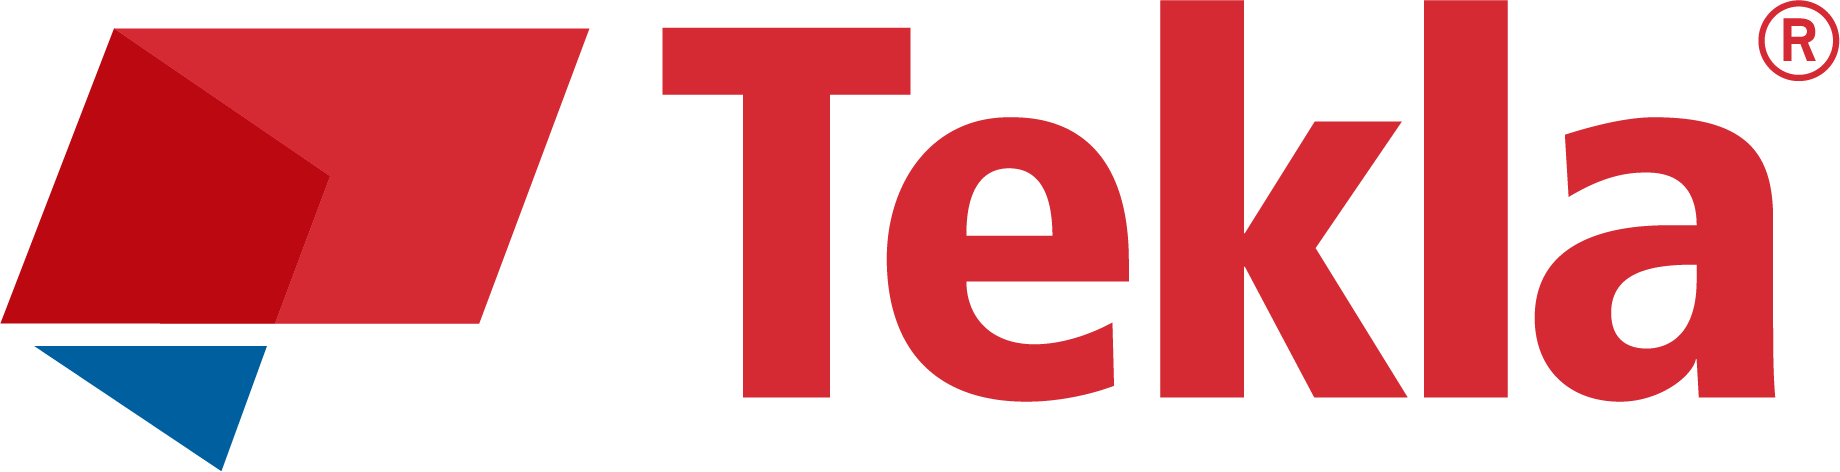 Tekla Tedds Alternatives & Competitors | G2